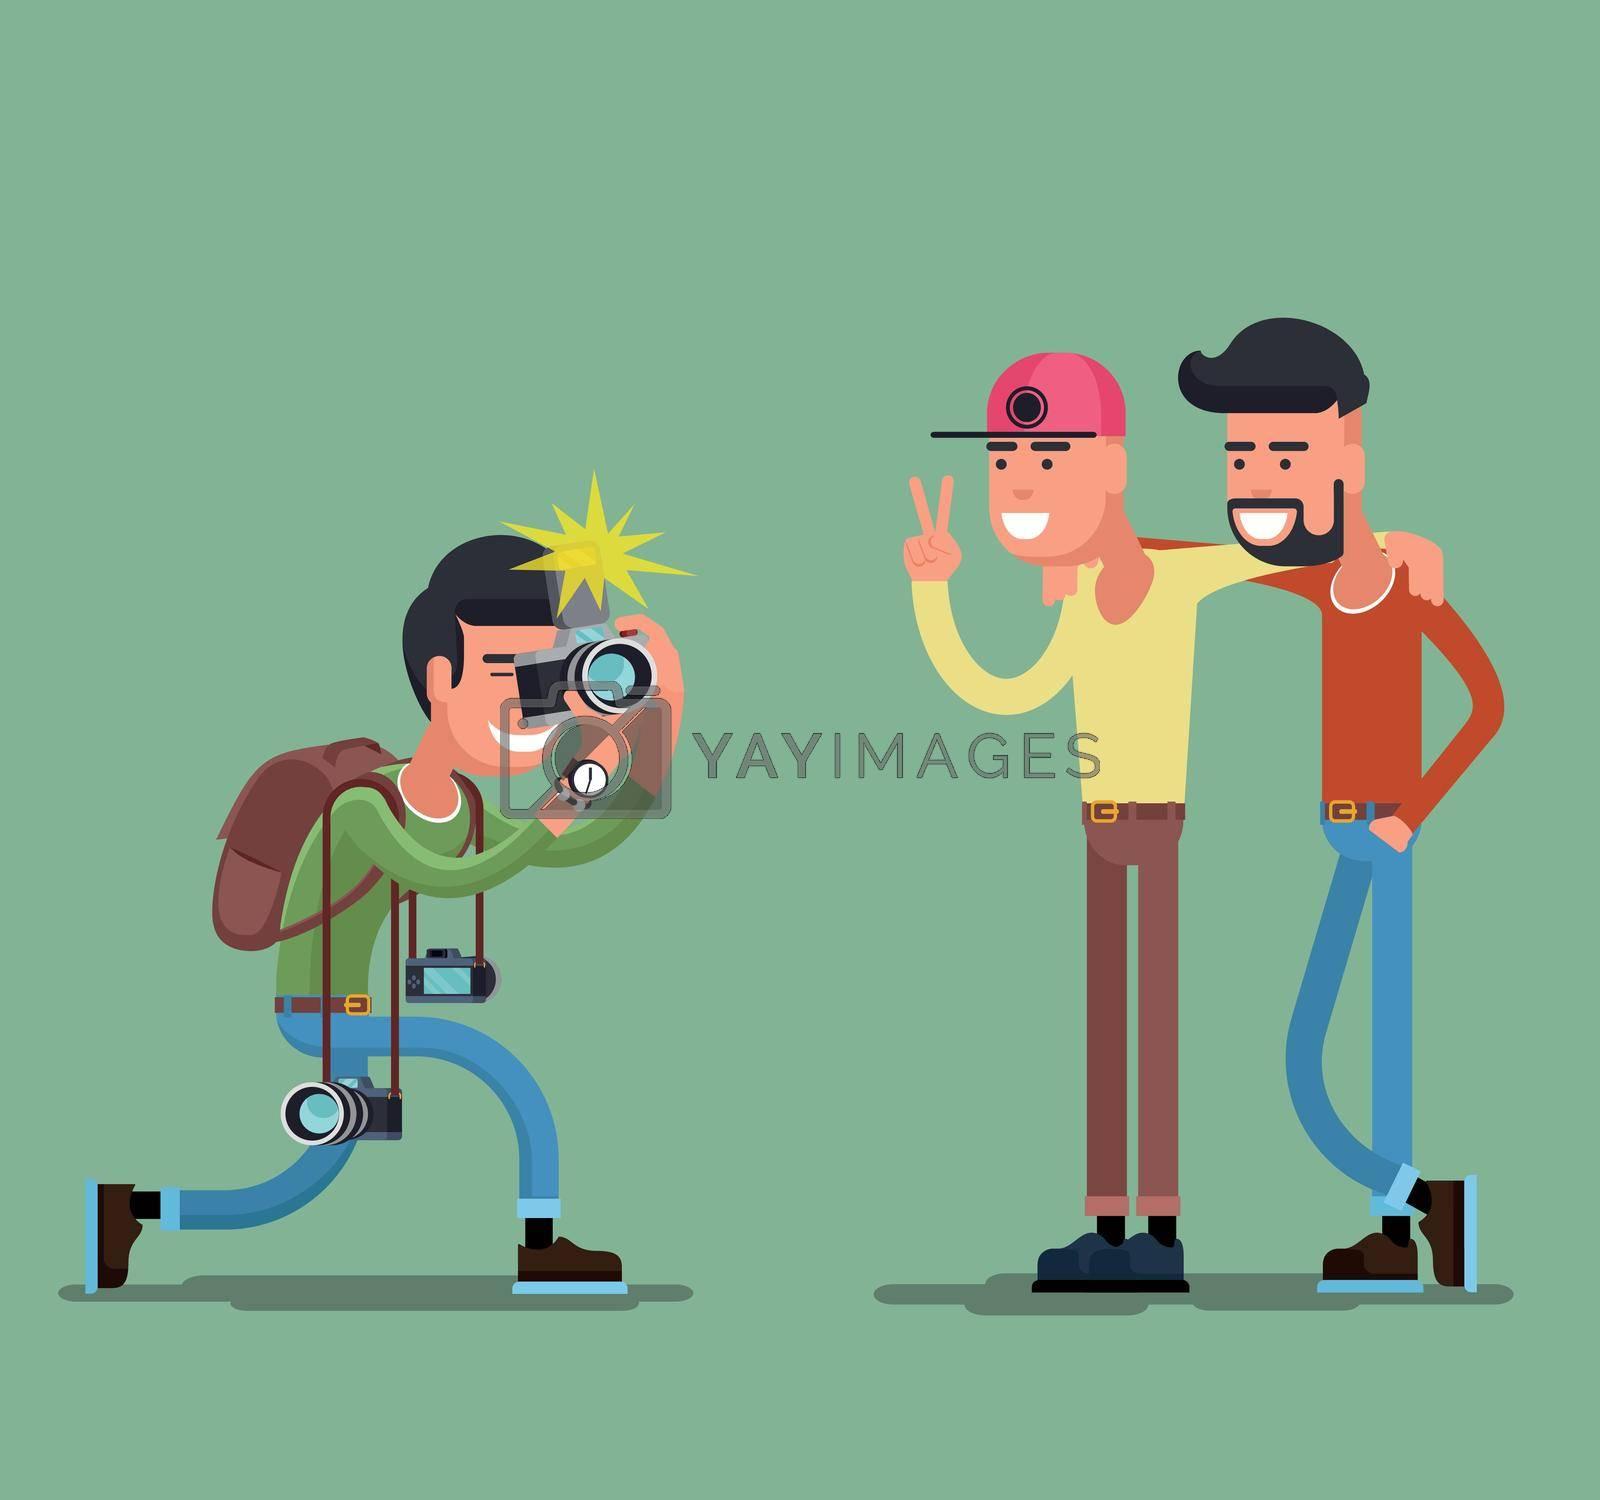 Royalty free image of Photographer shooting people by mstjahanara